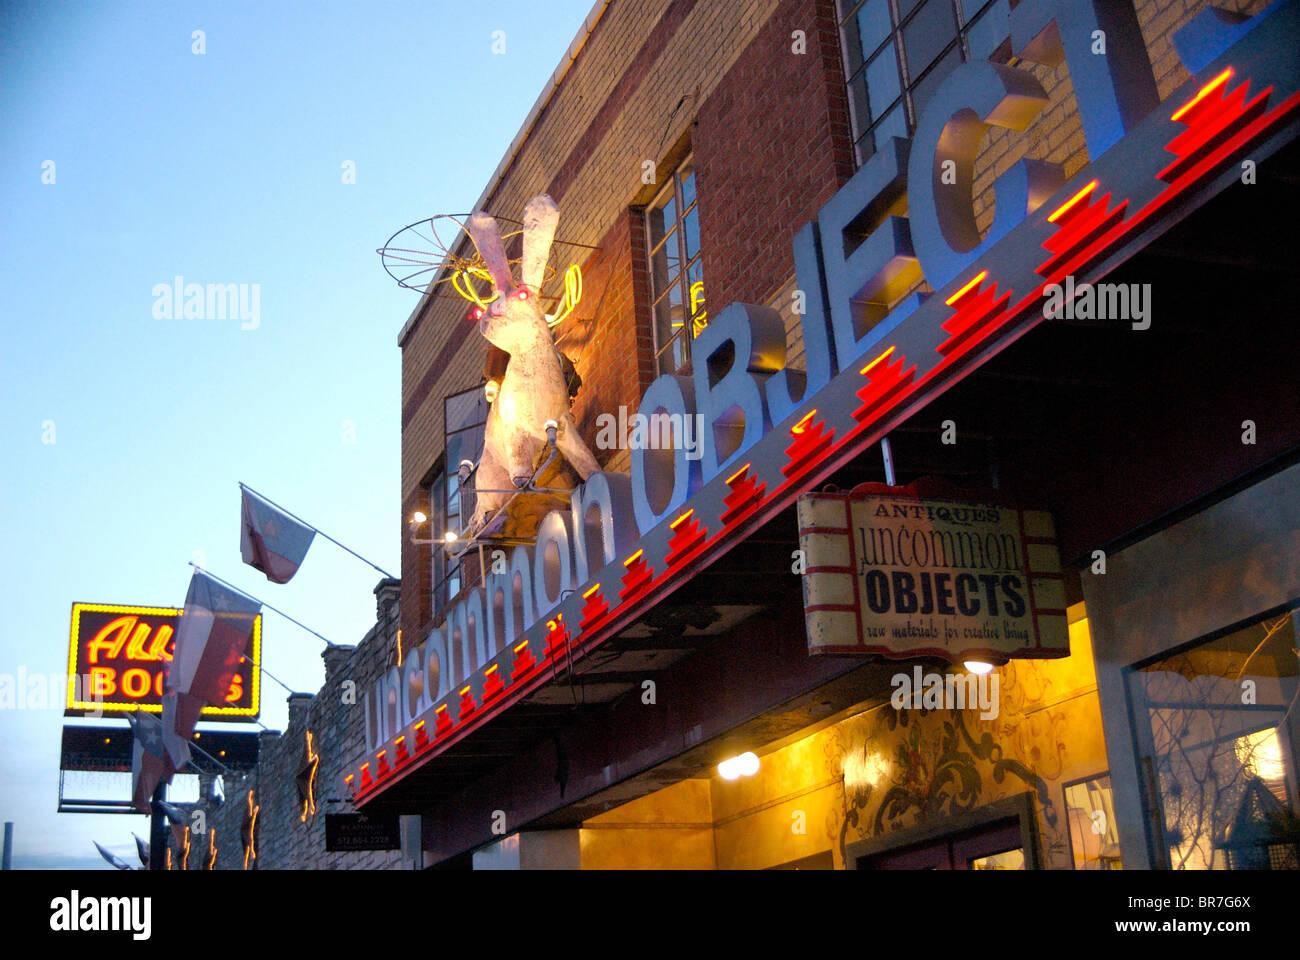 Shops along South Congress in an artsy Austin TX neighborhood. - Stock Image